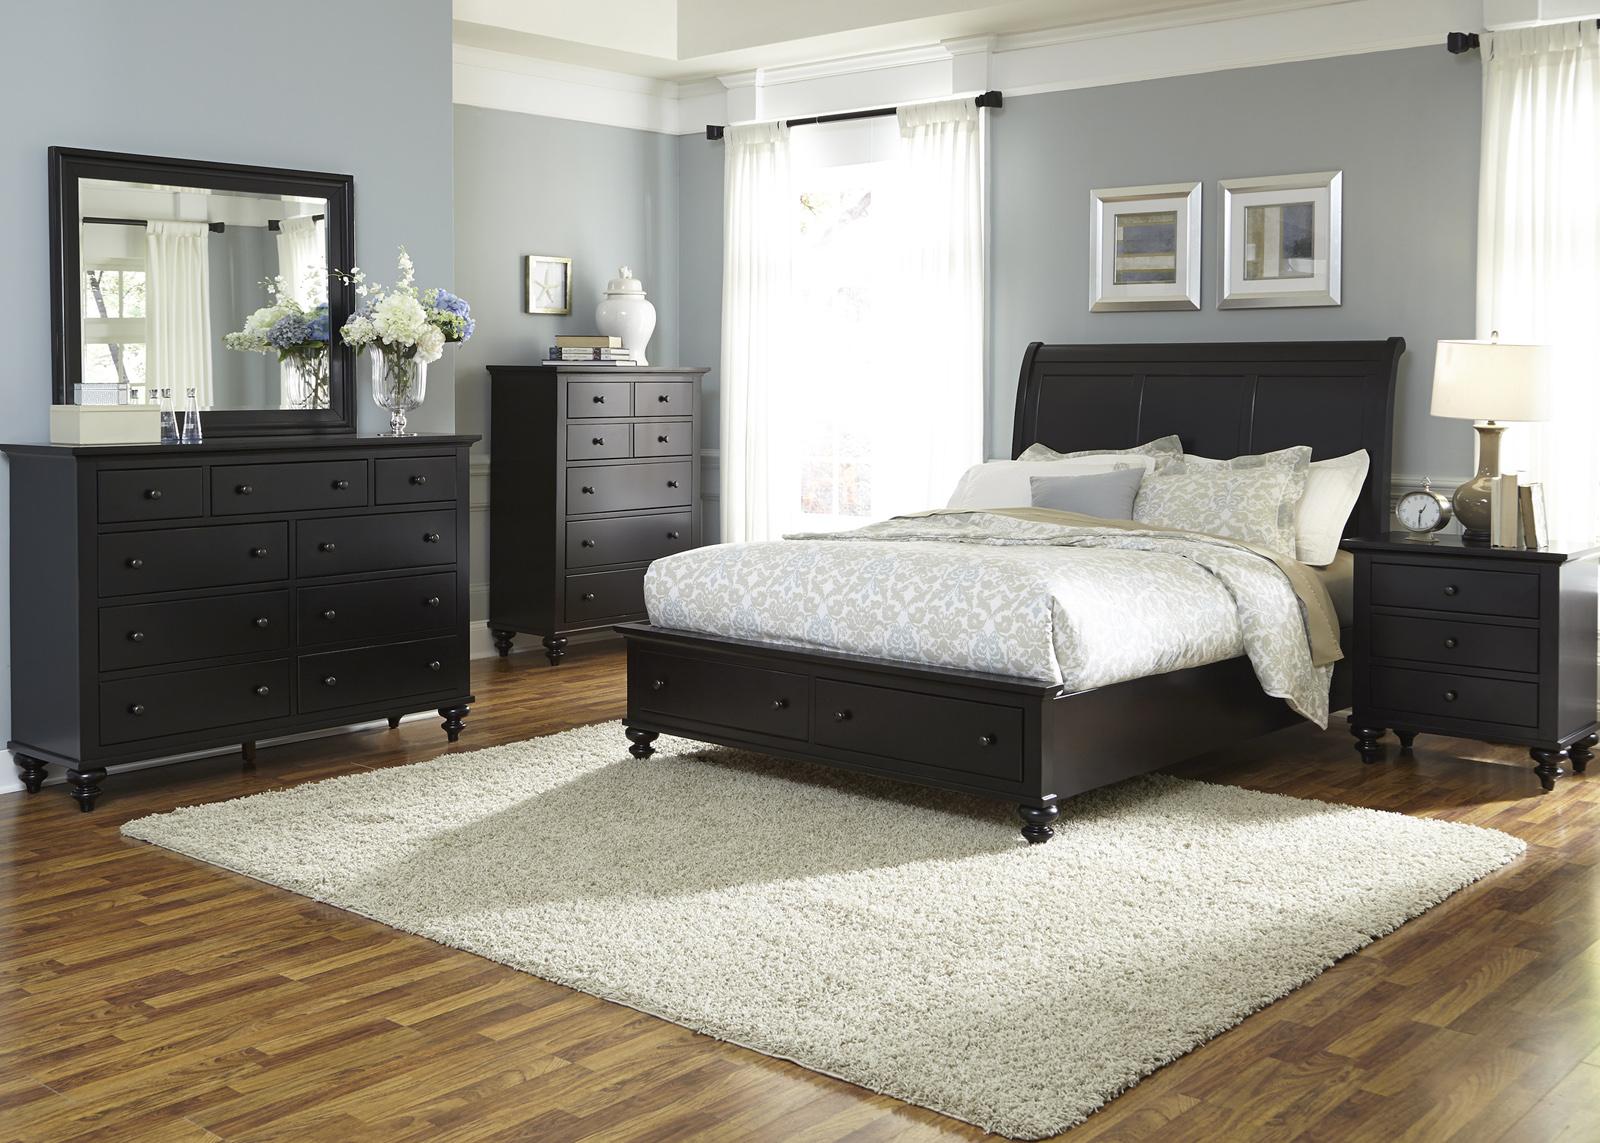 Liberty Furniture Hamilton III Storage Bedroom Set In